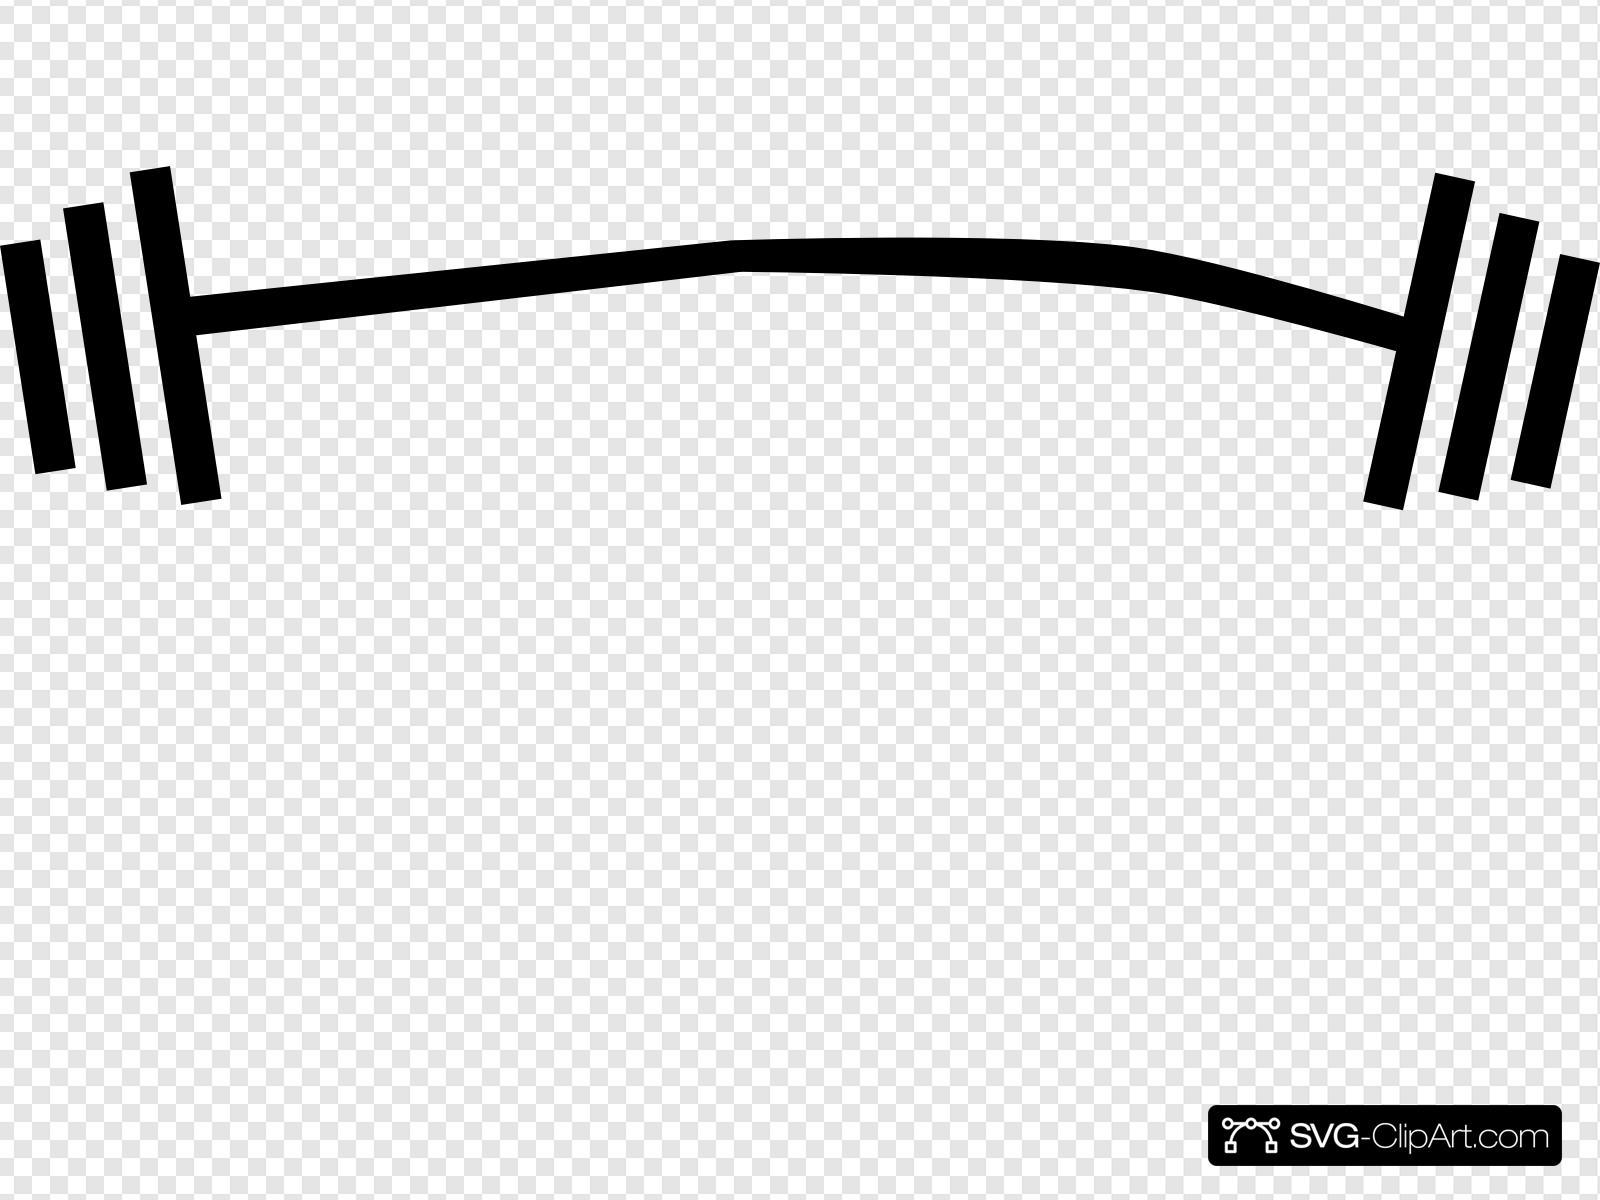 Weight clipart svg. Lifting barbell clip art